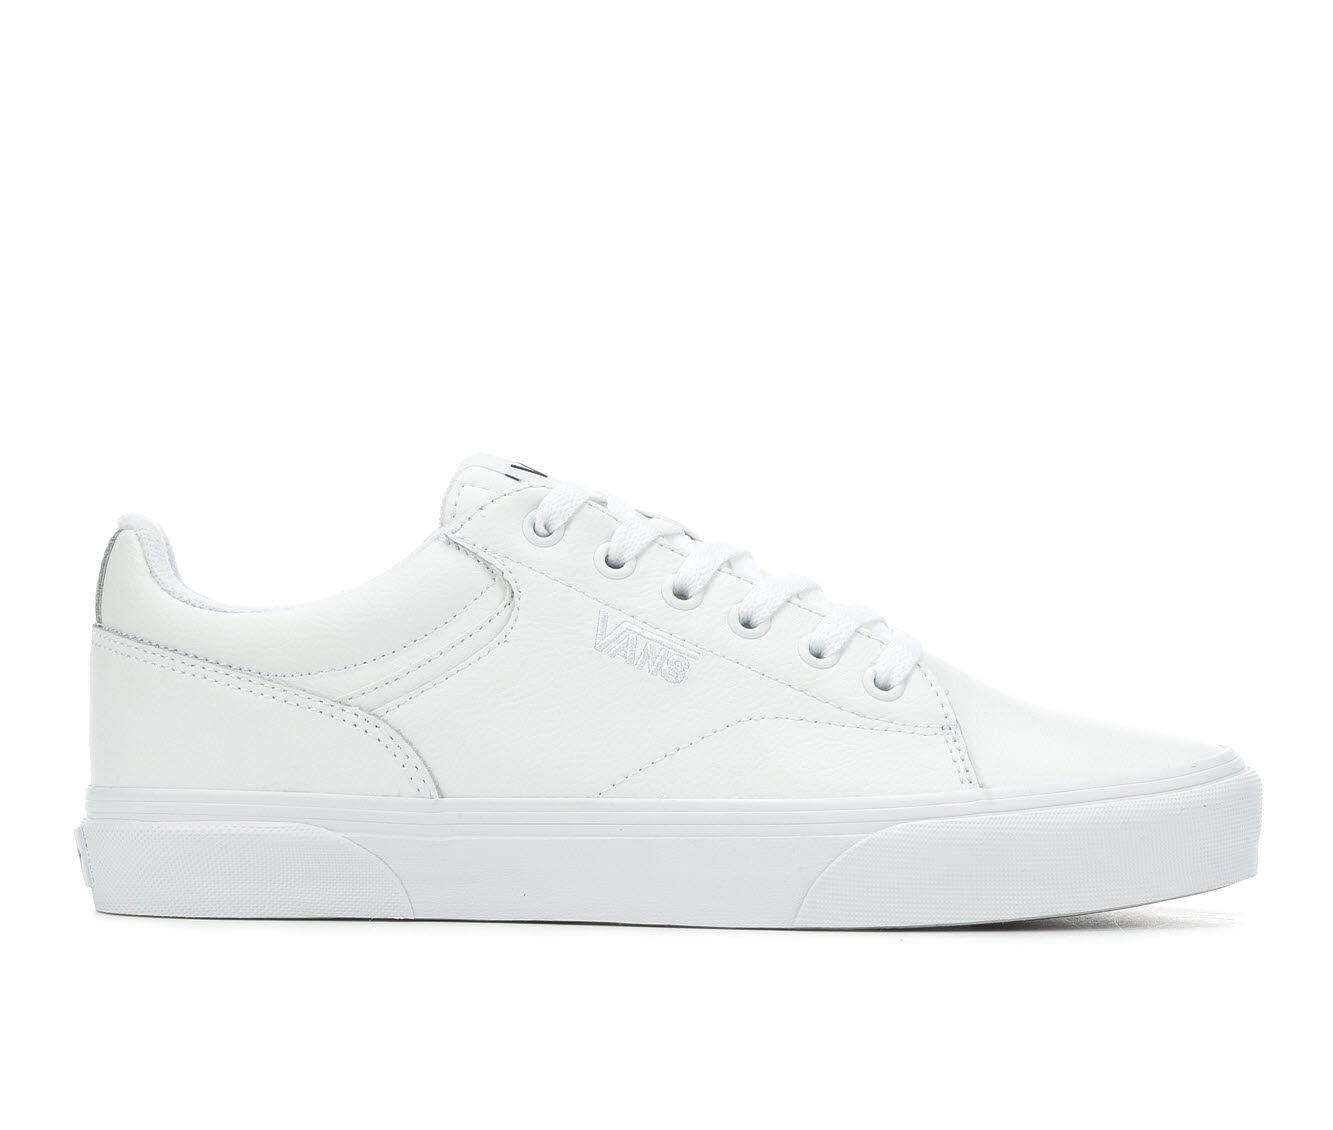 Vans Seldan Skate Shoes | Shoe Carnival